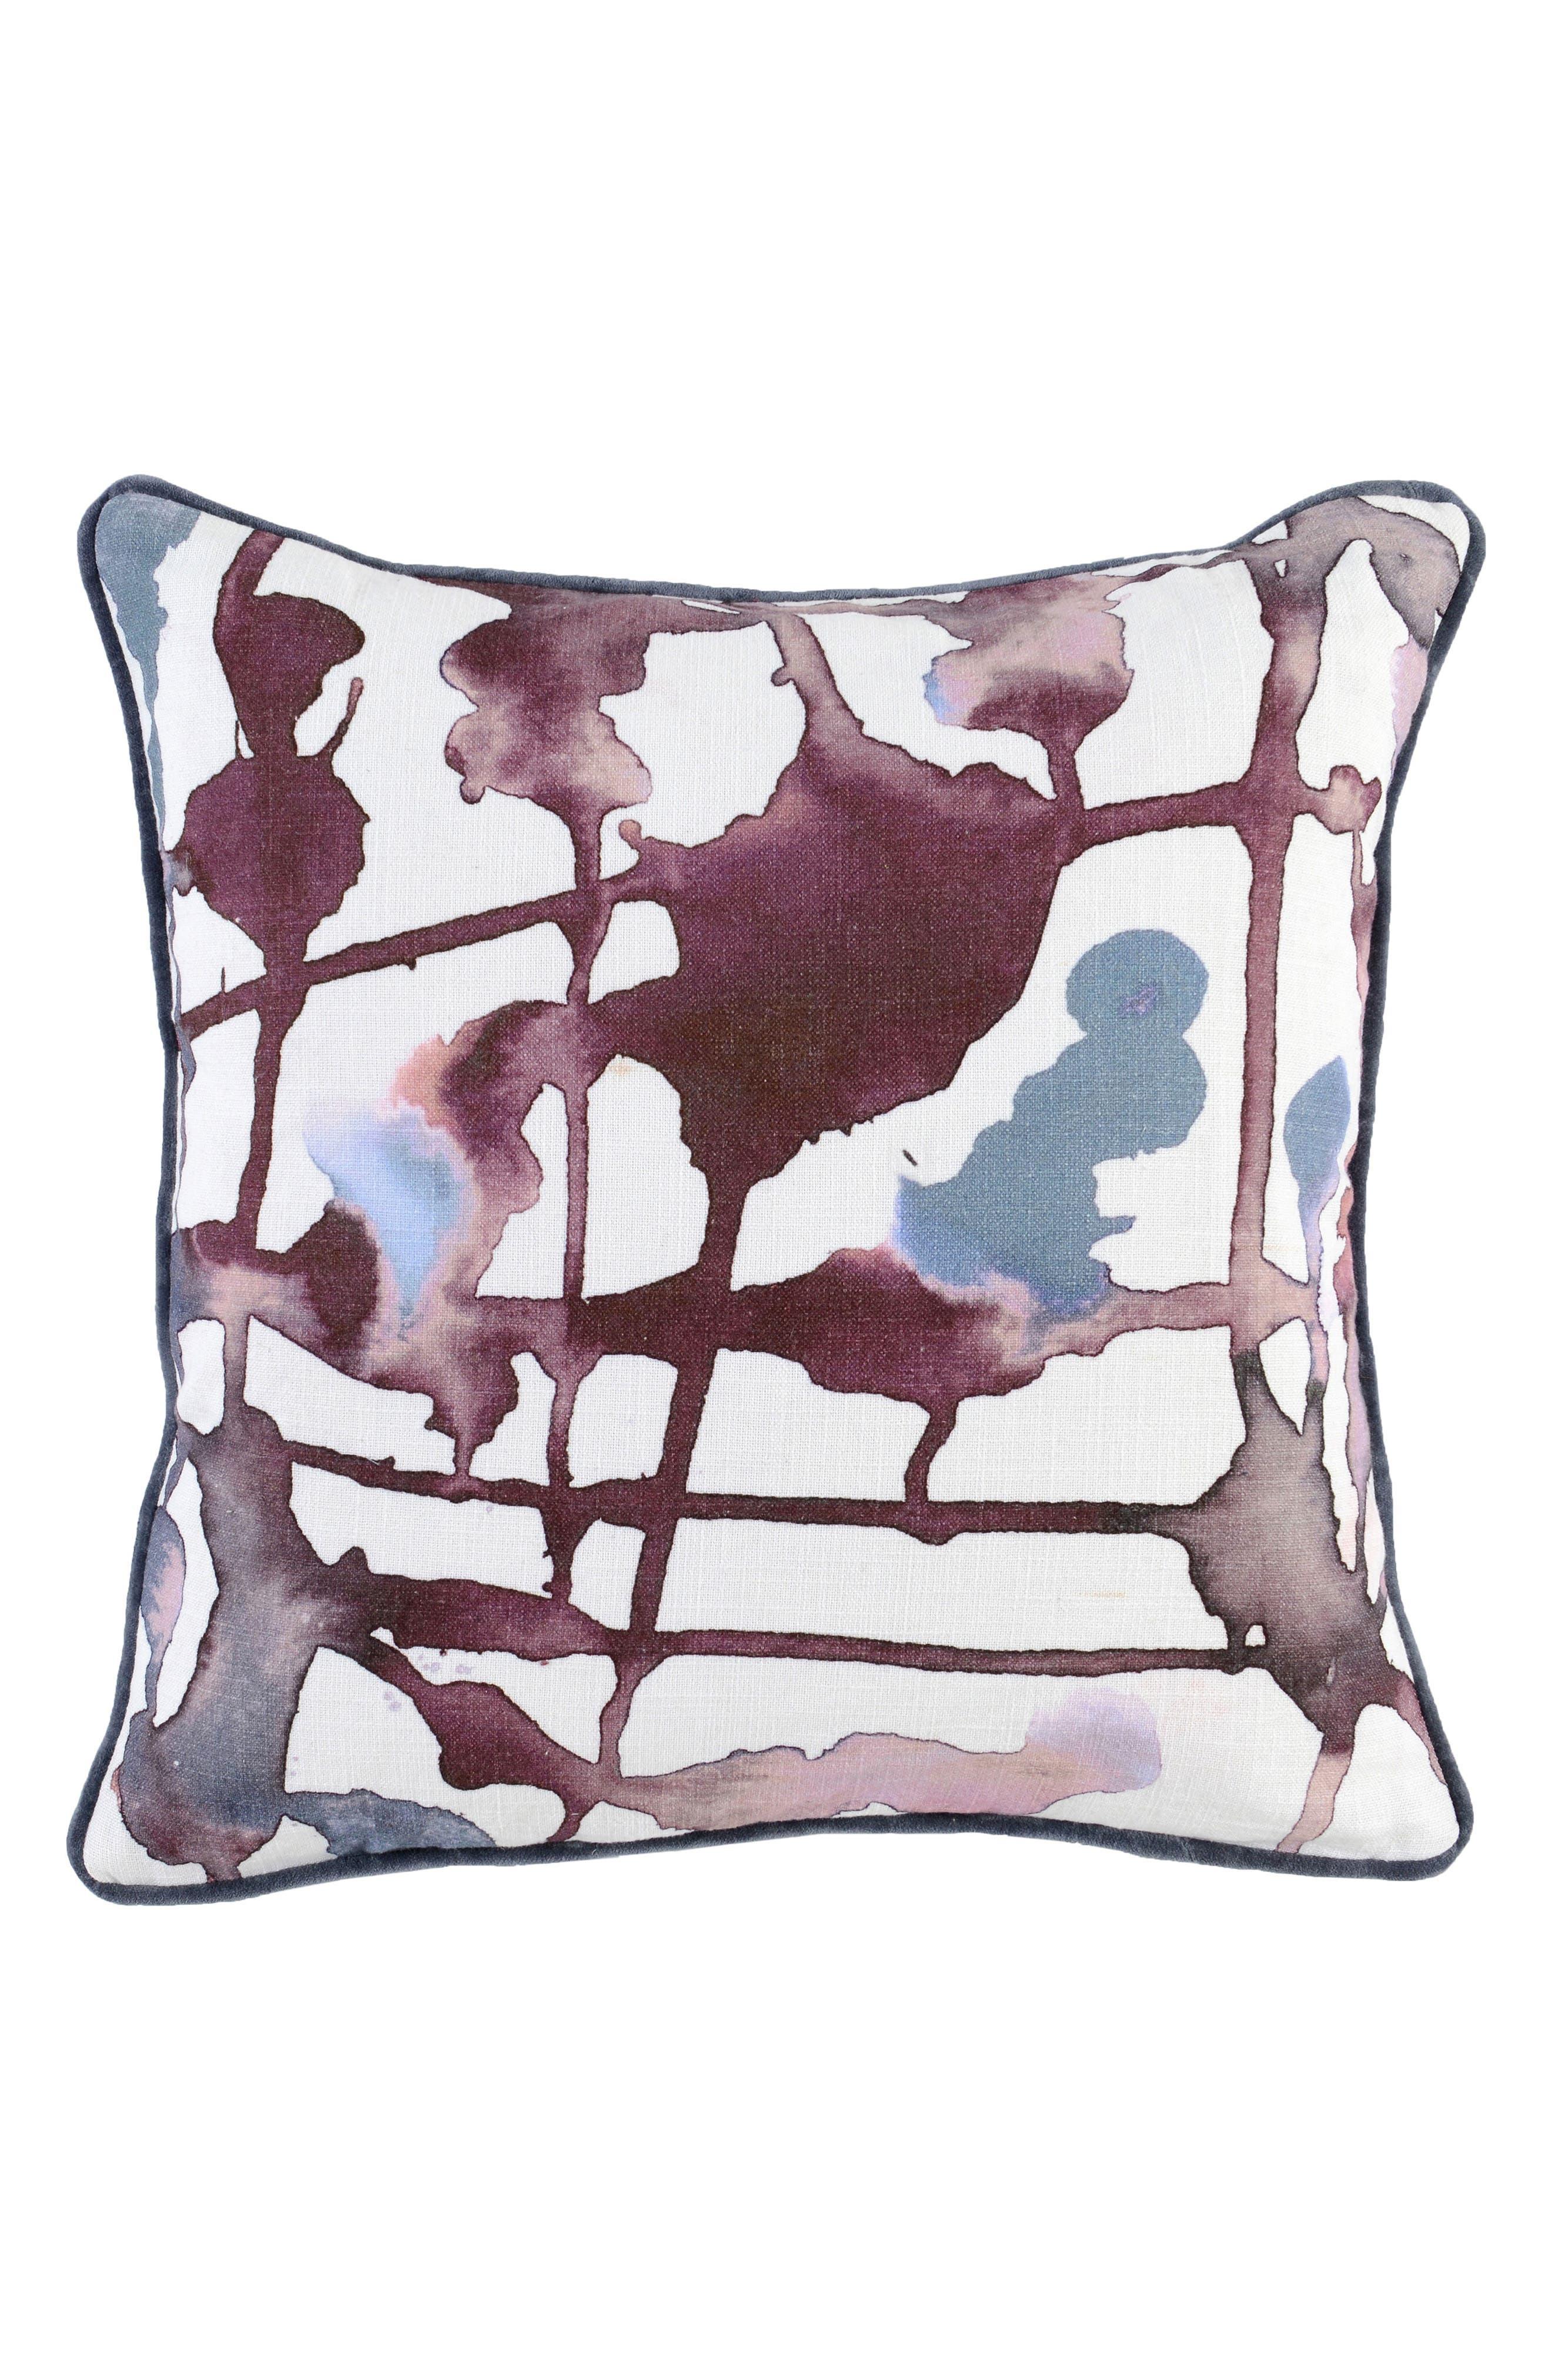 Lillian Accent Pillow,                         Main,                         color, Wine/ Gray